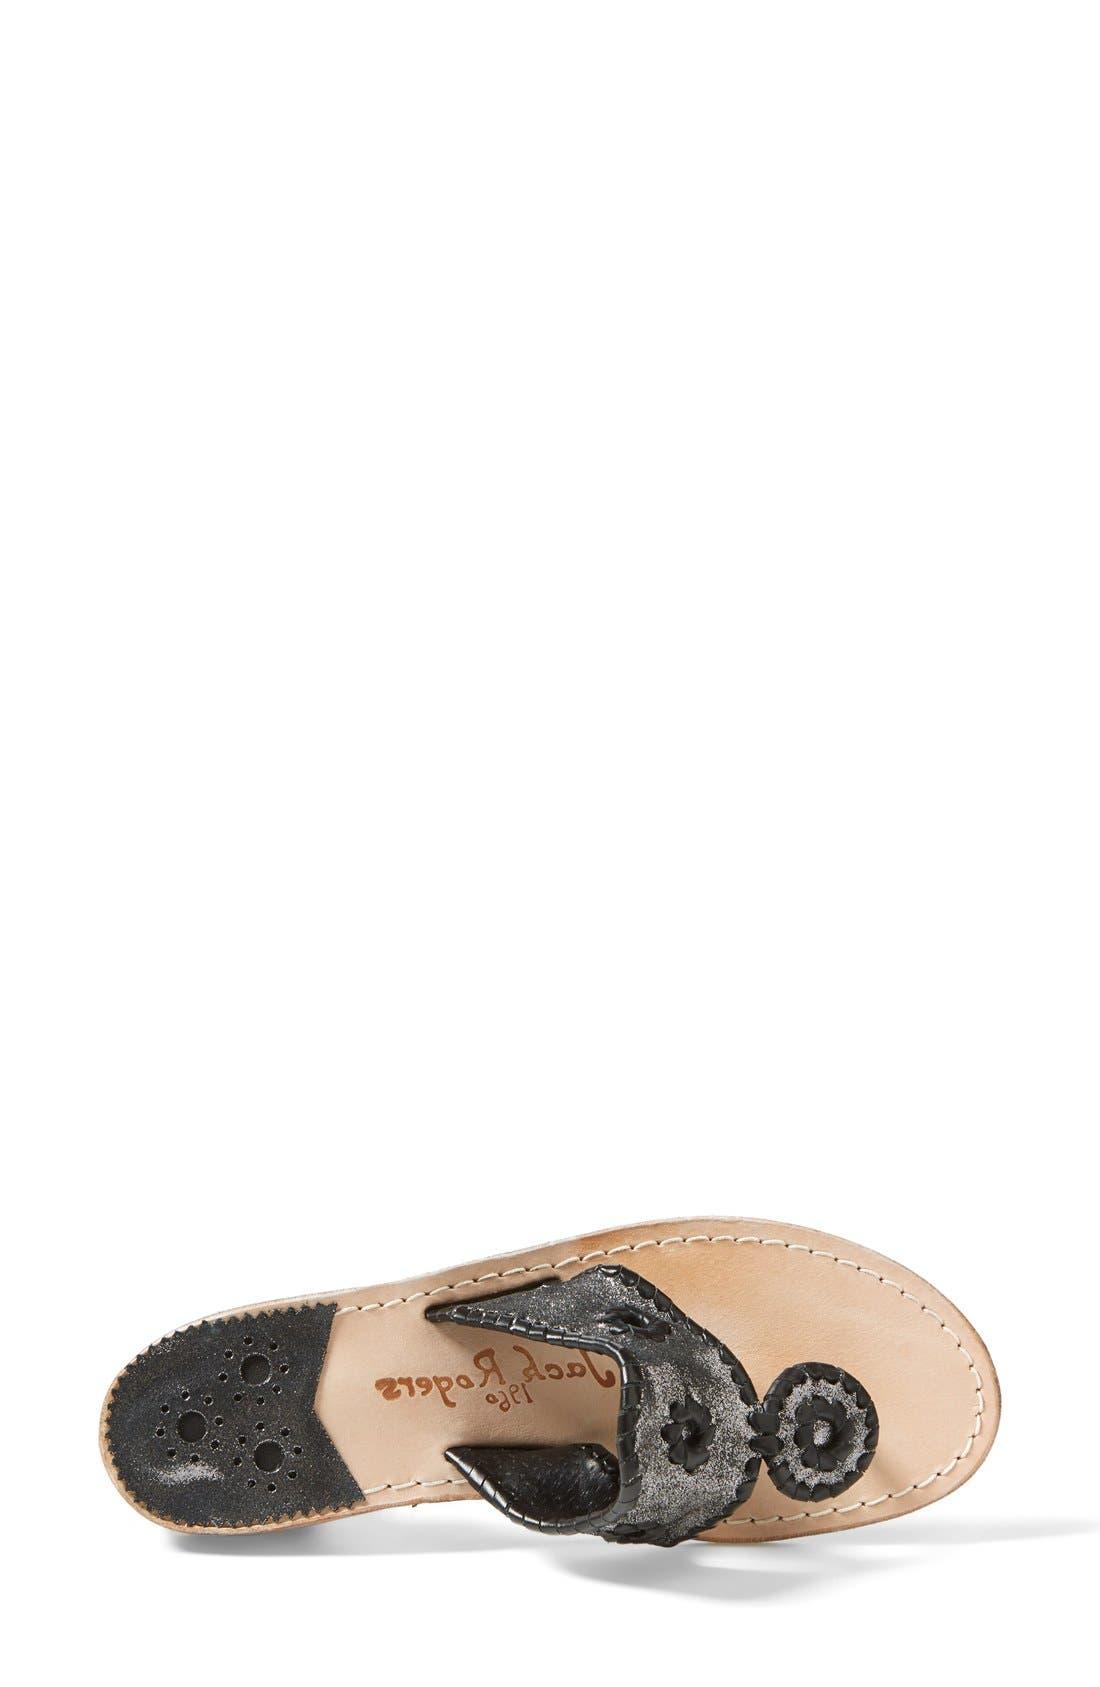 Alternate Image 3  - Jack Rogers 'Stardust' Thong Sandal (Women)